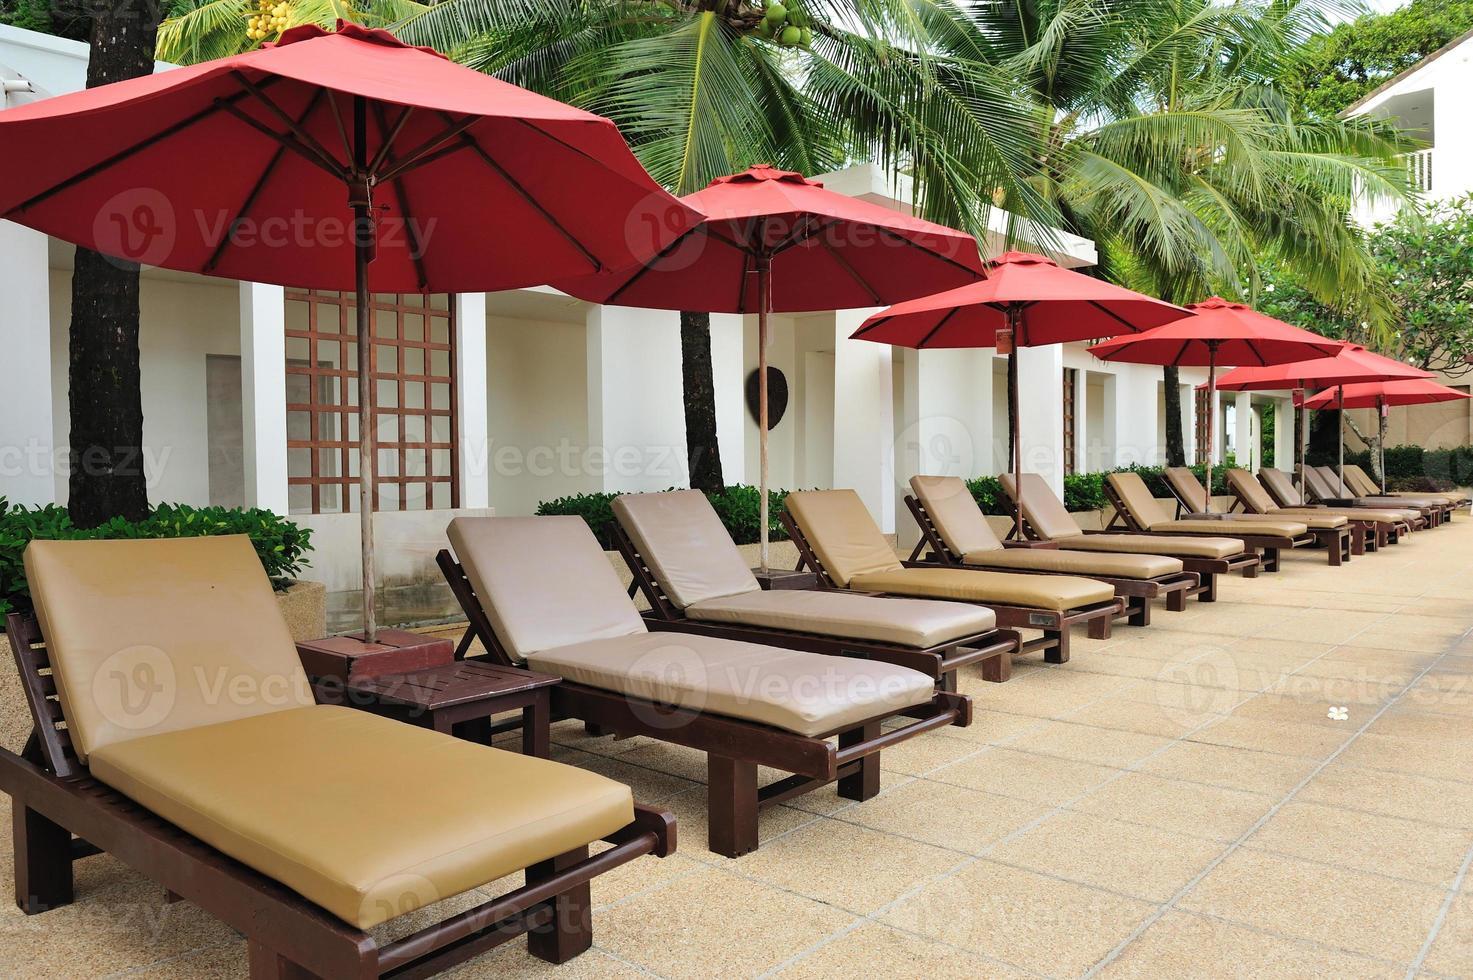 silla de playa tropical foto